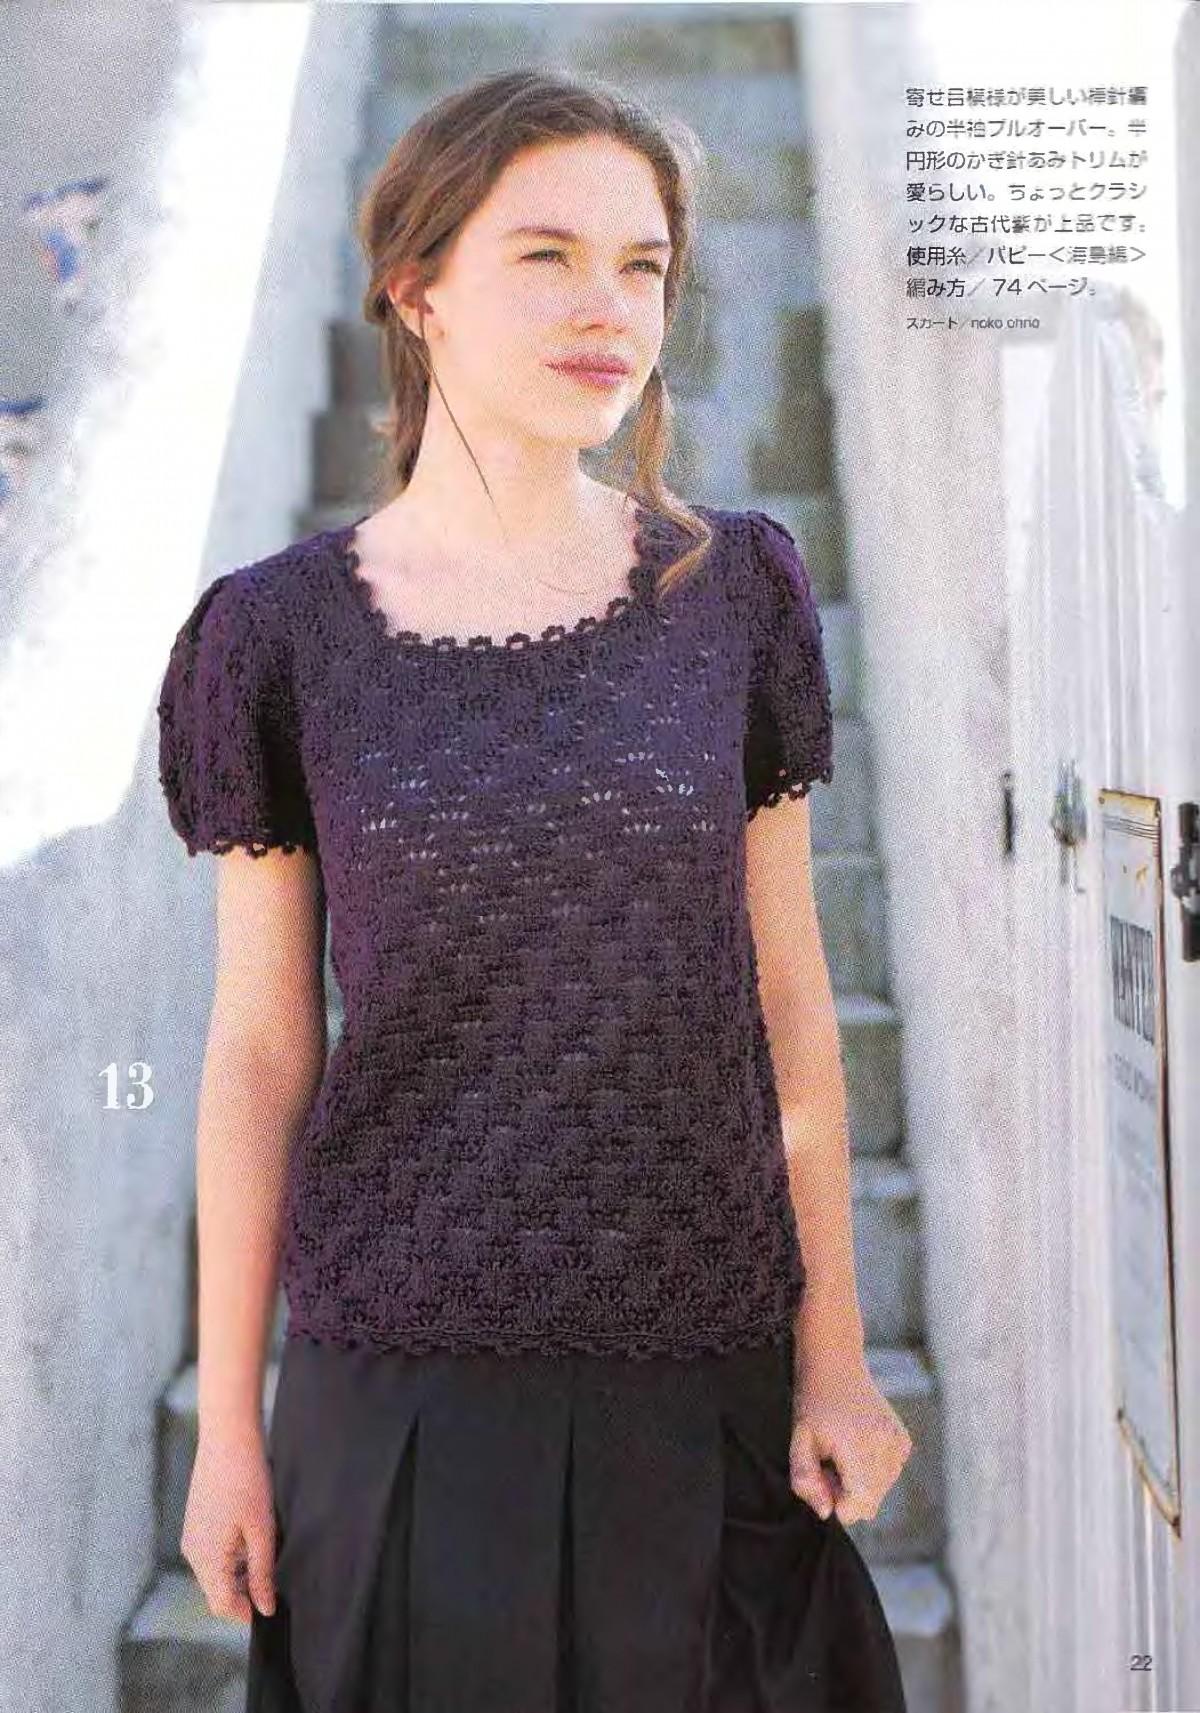 Lets-knit-series-NV4359-2008-Spring-Summer-sp-kr_20.jpg